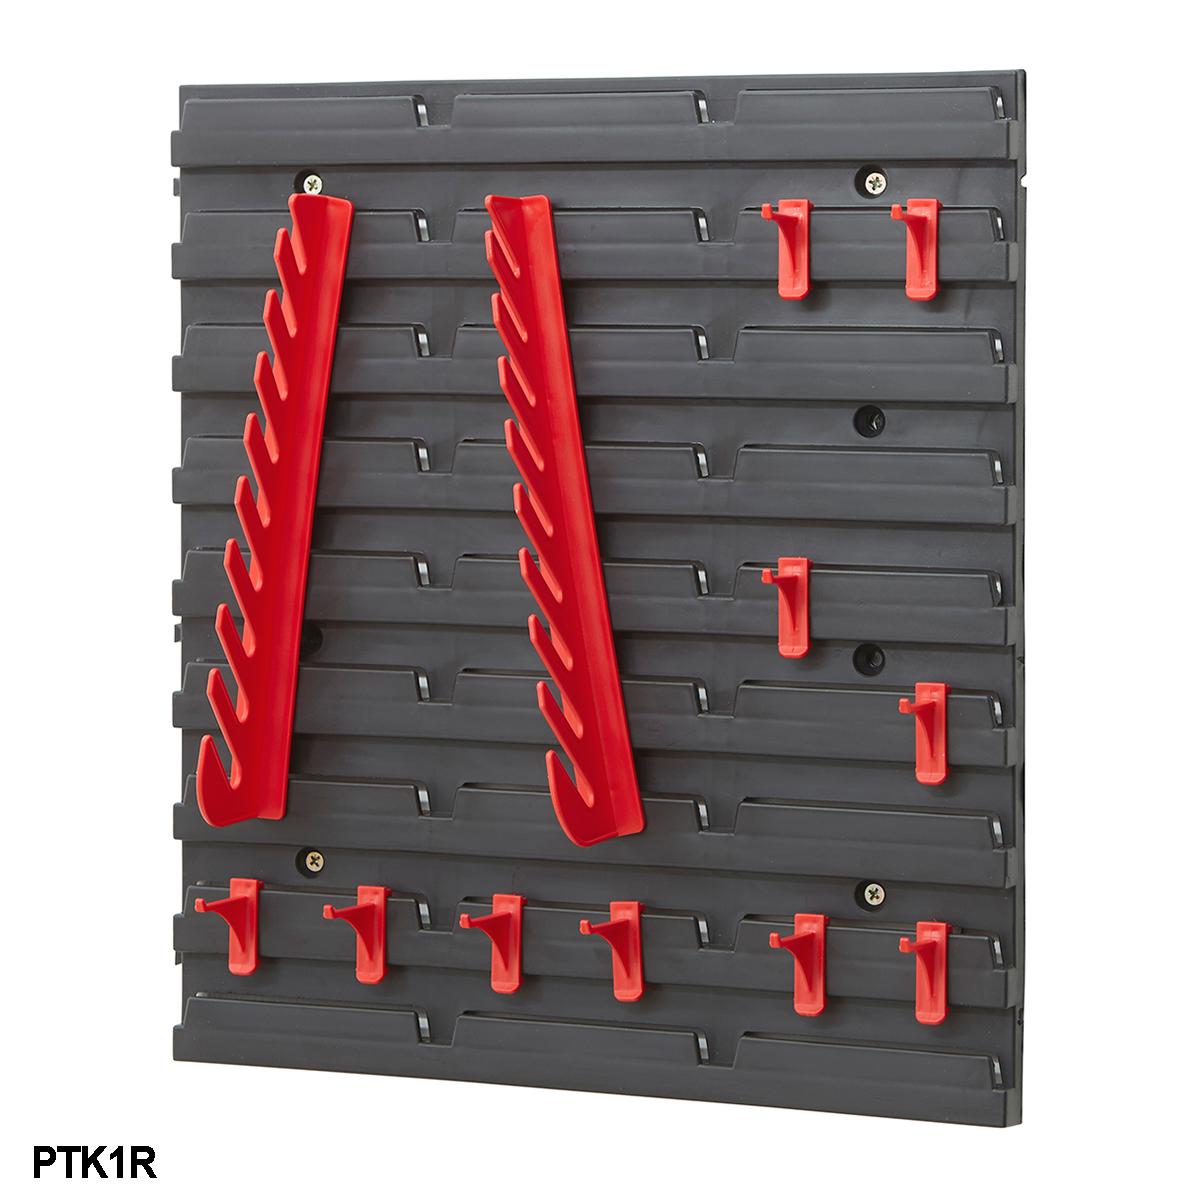 Louvre Panel Tool Rack Kits Garage Storage Shelving Tool